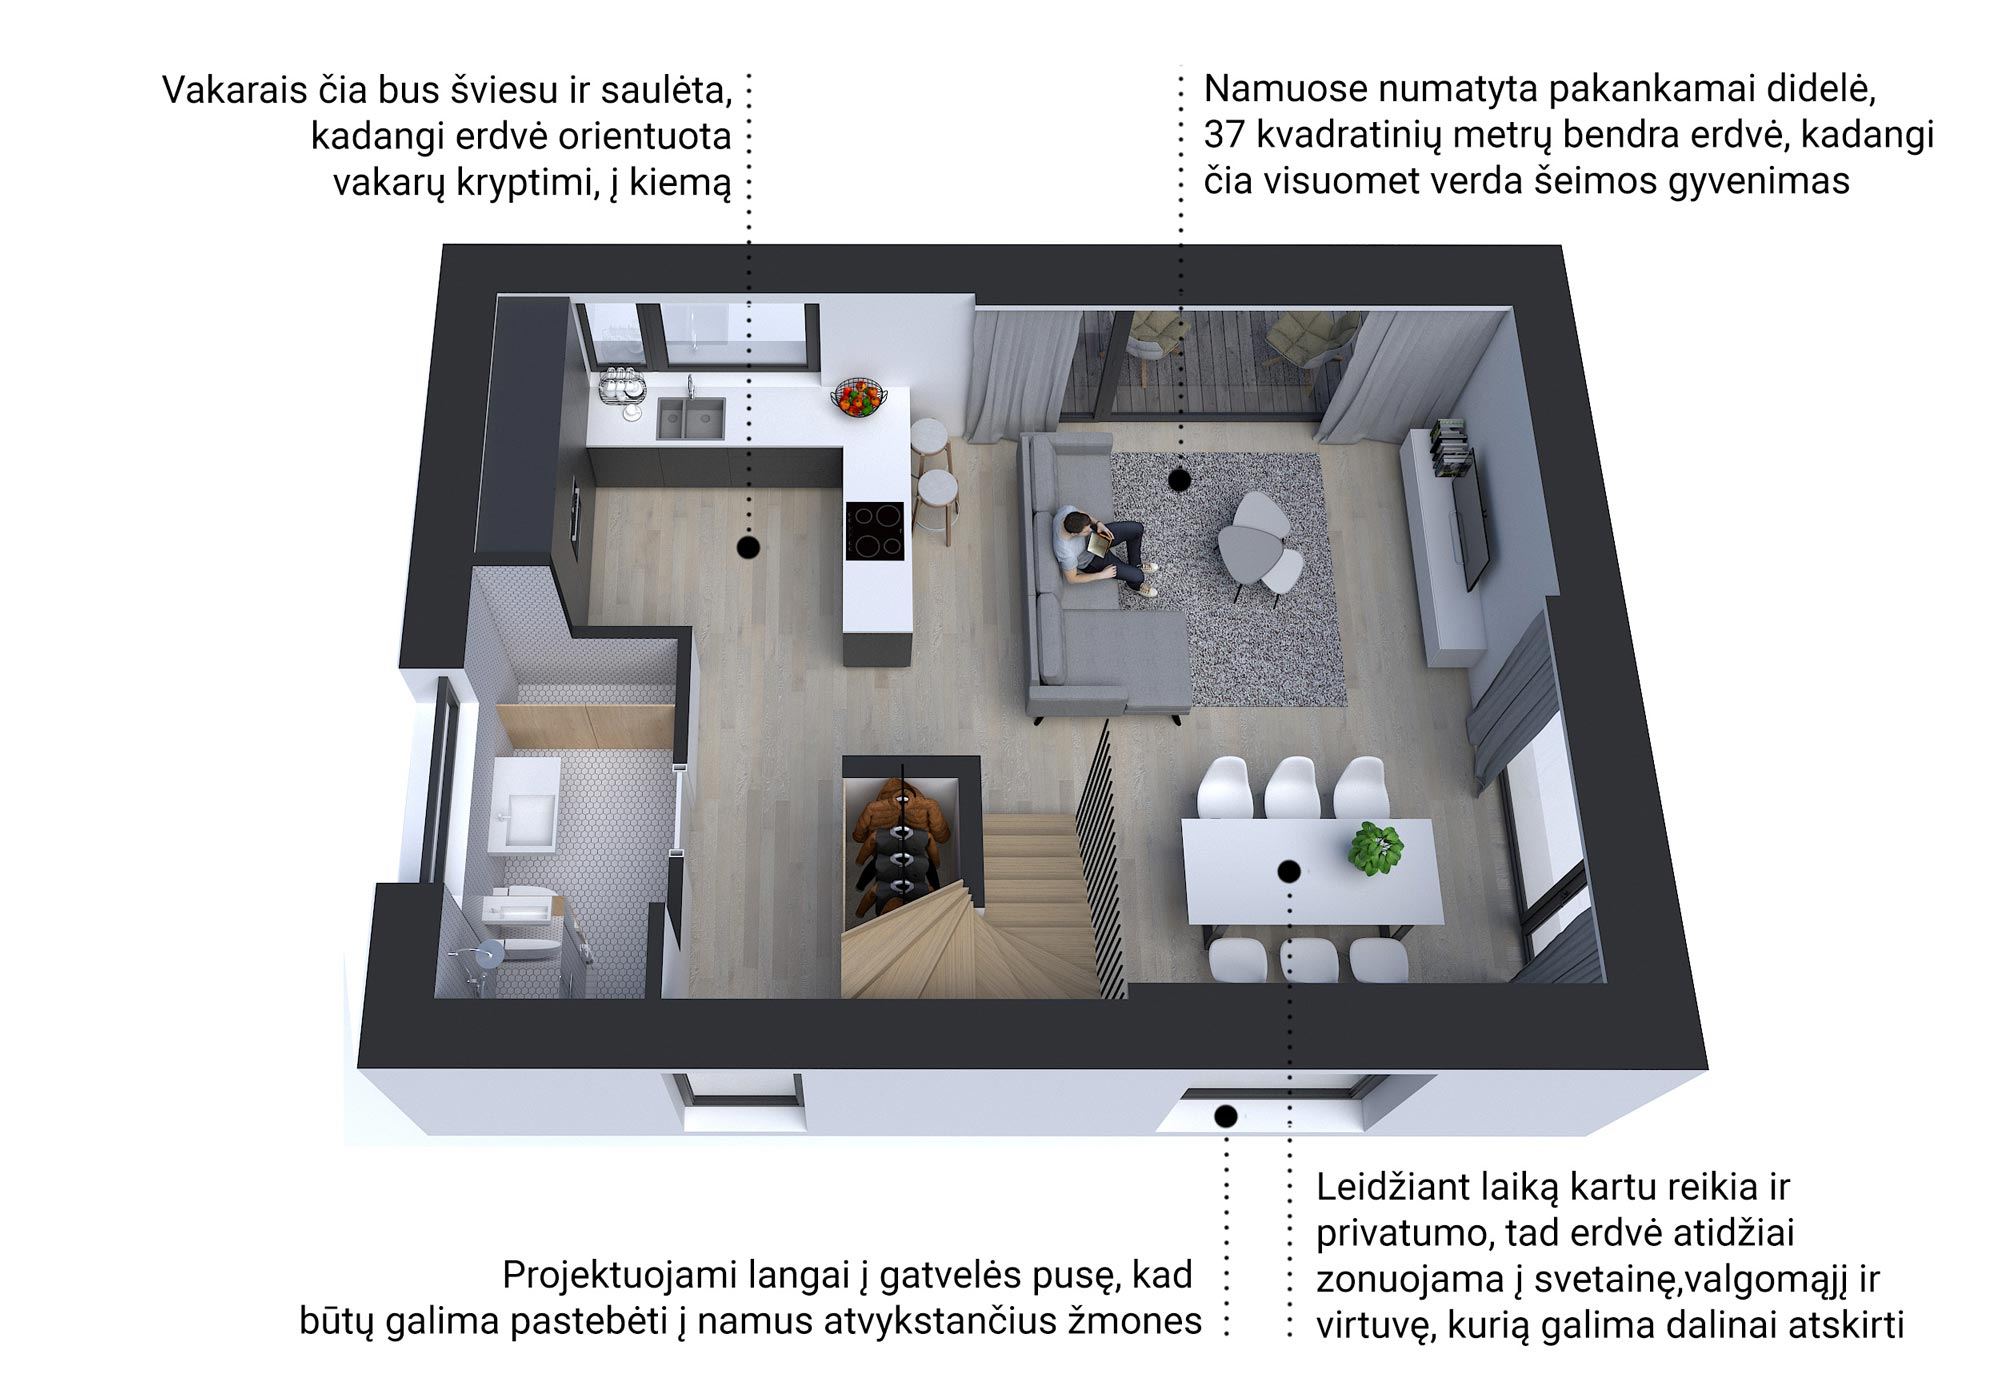 kubinis-metras_balti-balti-namai_kvartalas_1a3d-planas